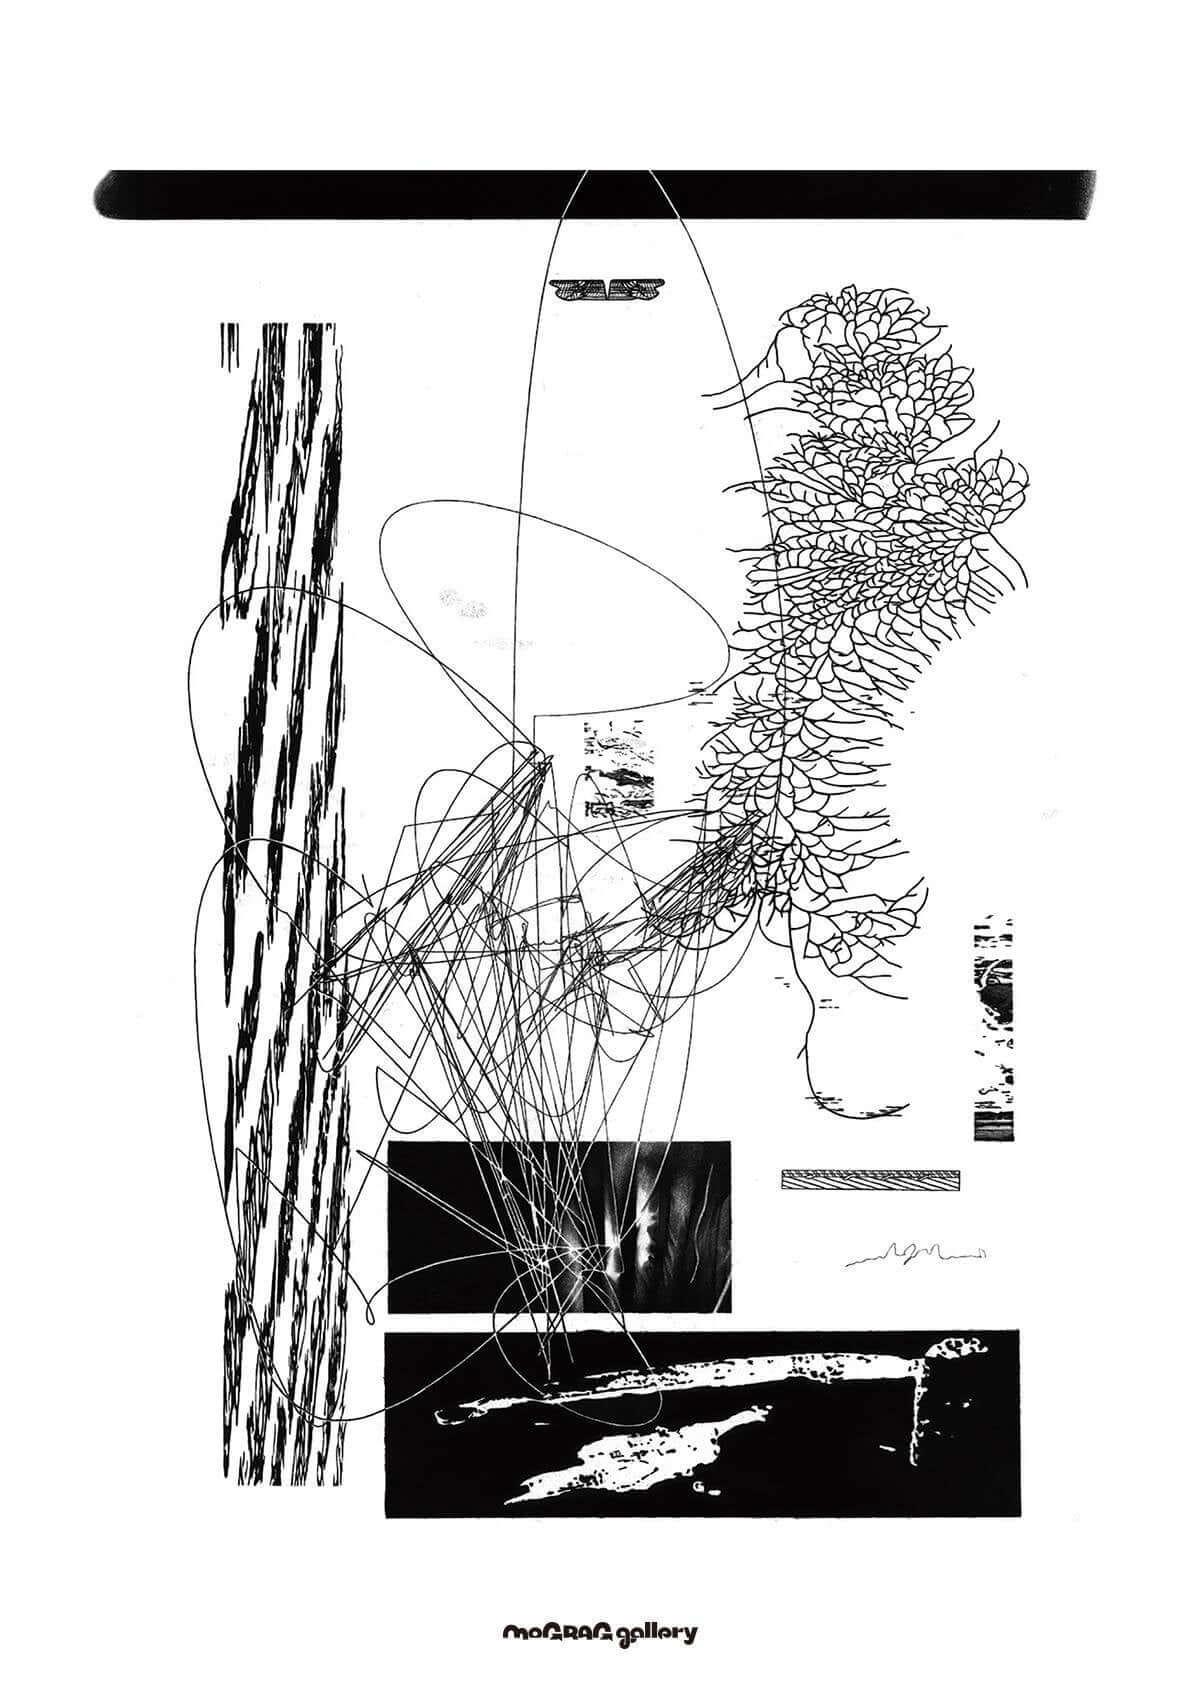 ARIKAの個展「scape:000」がmograg galleryにて4月28日まで開催。今回の展示での新たな試みとは? art-culture190422-arika-2-1200x1705